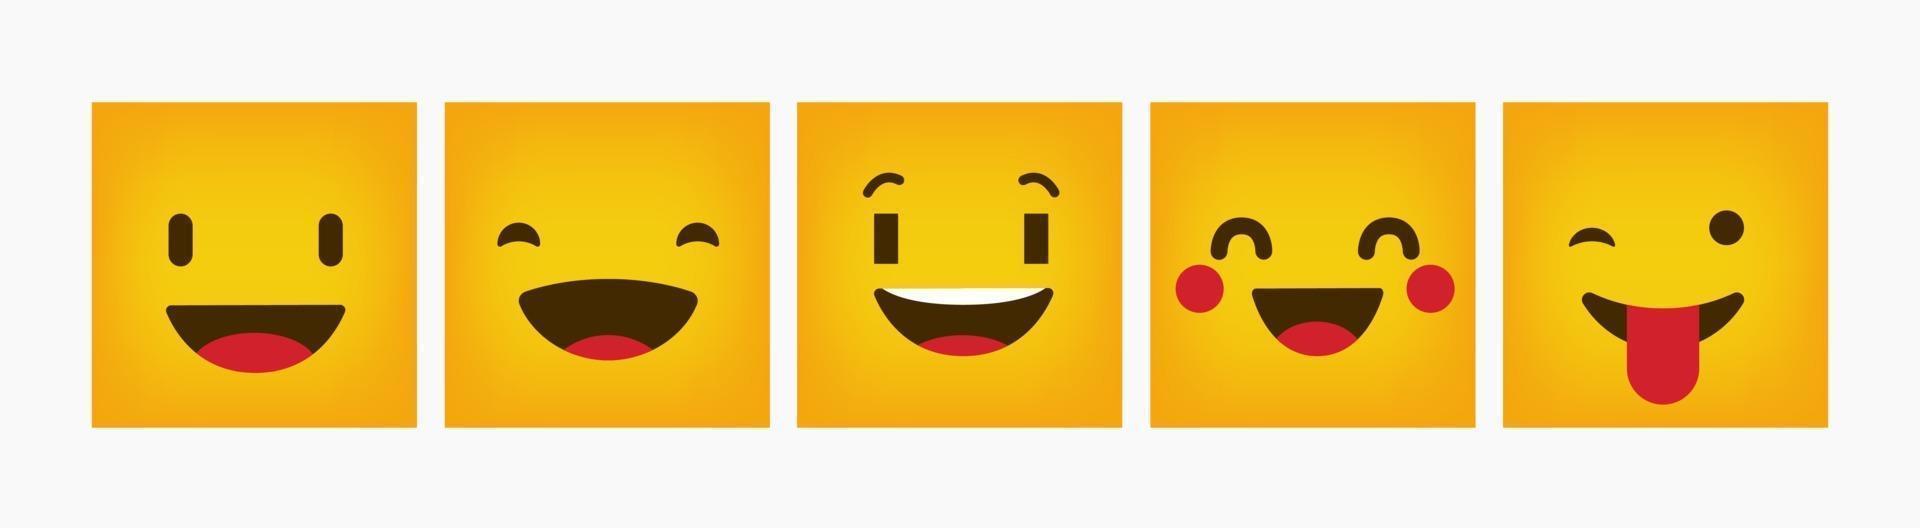 Reaktionsdesign Emoticon Flat Square Set vektor